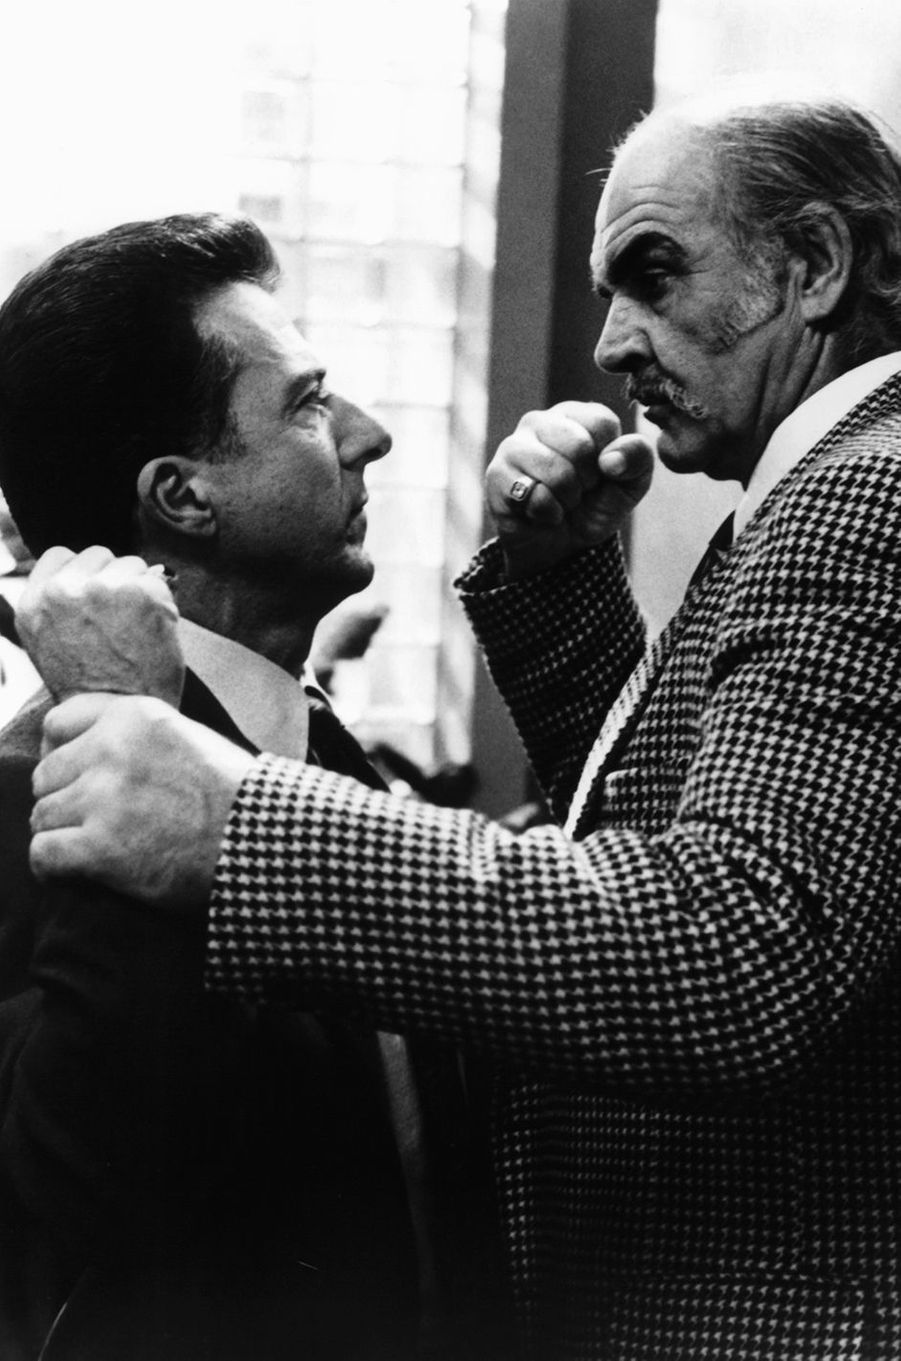 1989 : Sean Connery dans «Family business» de Sidney Lumet avec Dustin Hoffman